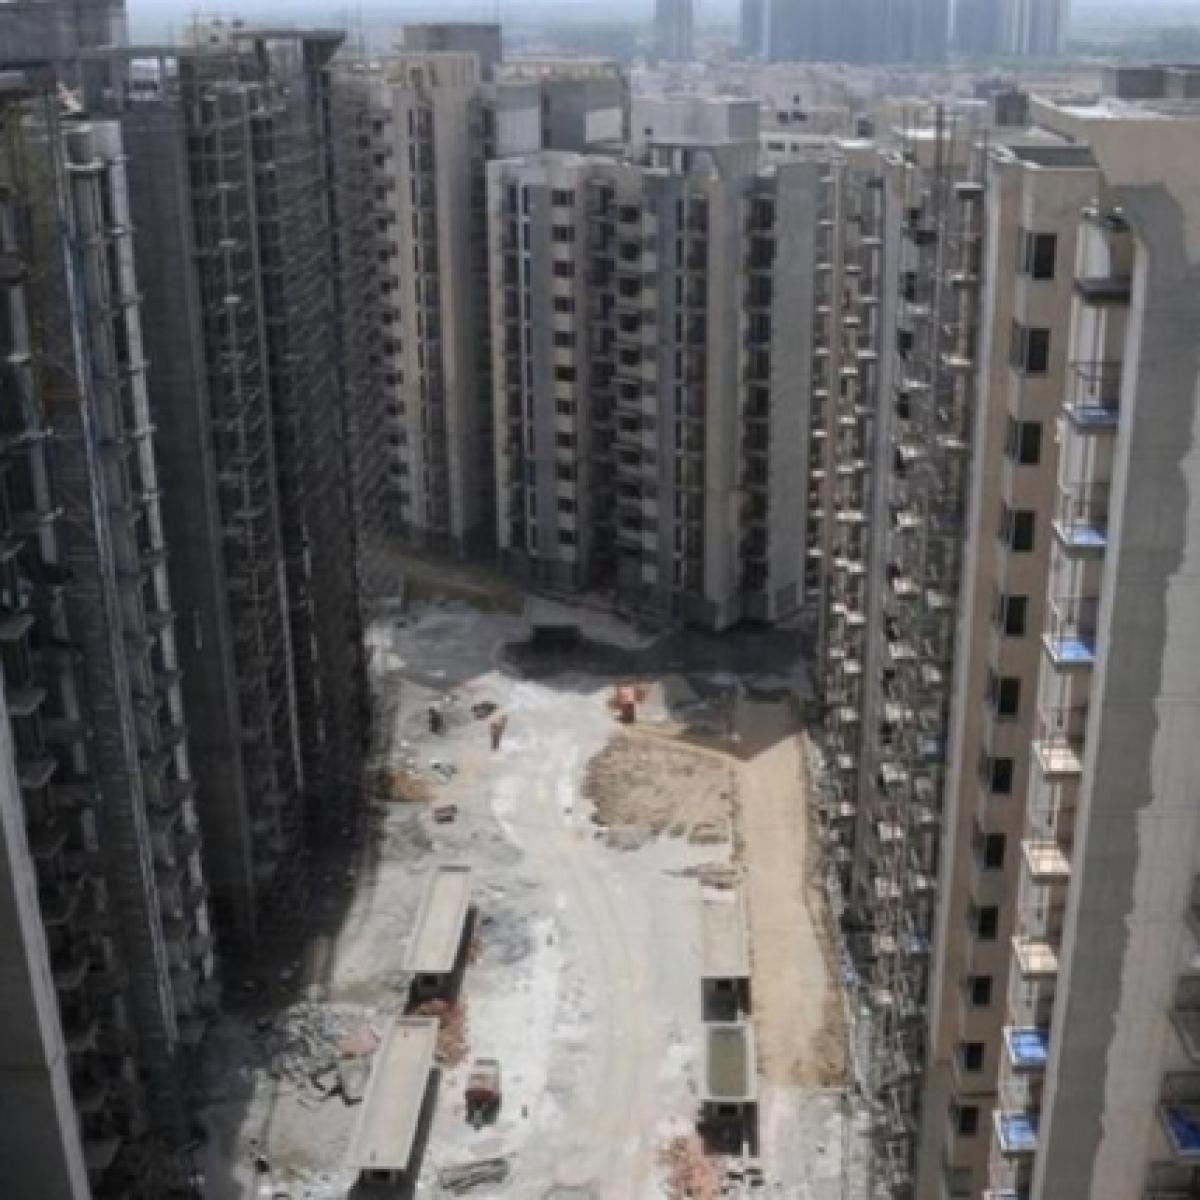 CIDCO to build 1.09 lakh affordable apartments on 568 acres in Navi Mumbai's Sanpada: Report